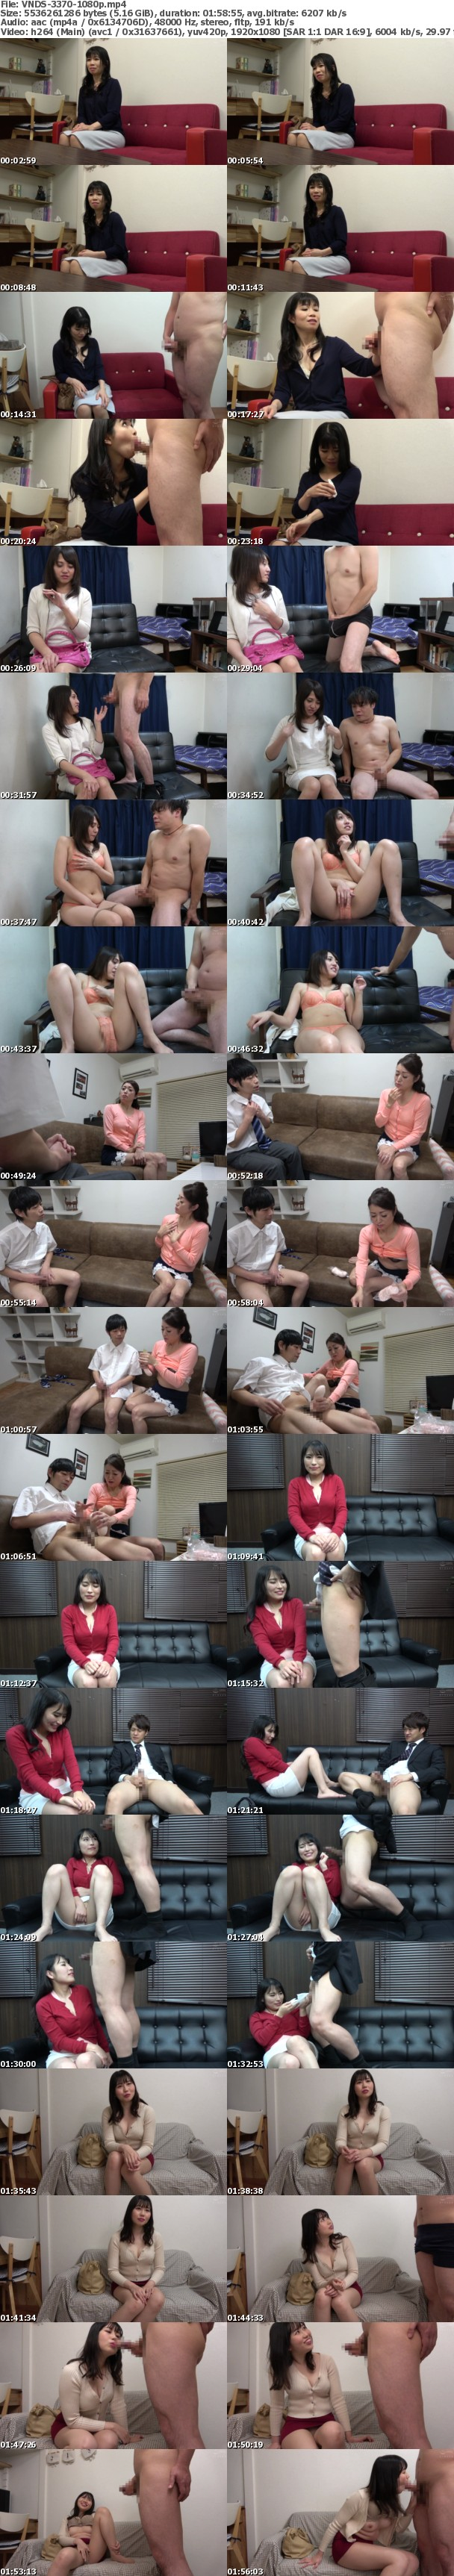 (Full HD) VNDS-3370 美人妻センズリ鑑賞会 VNDS-3370